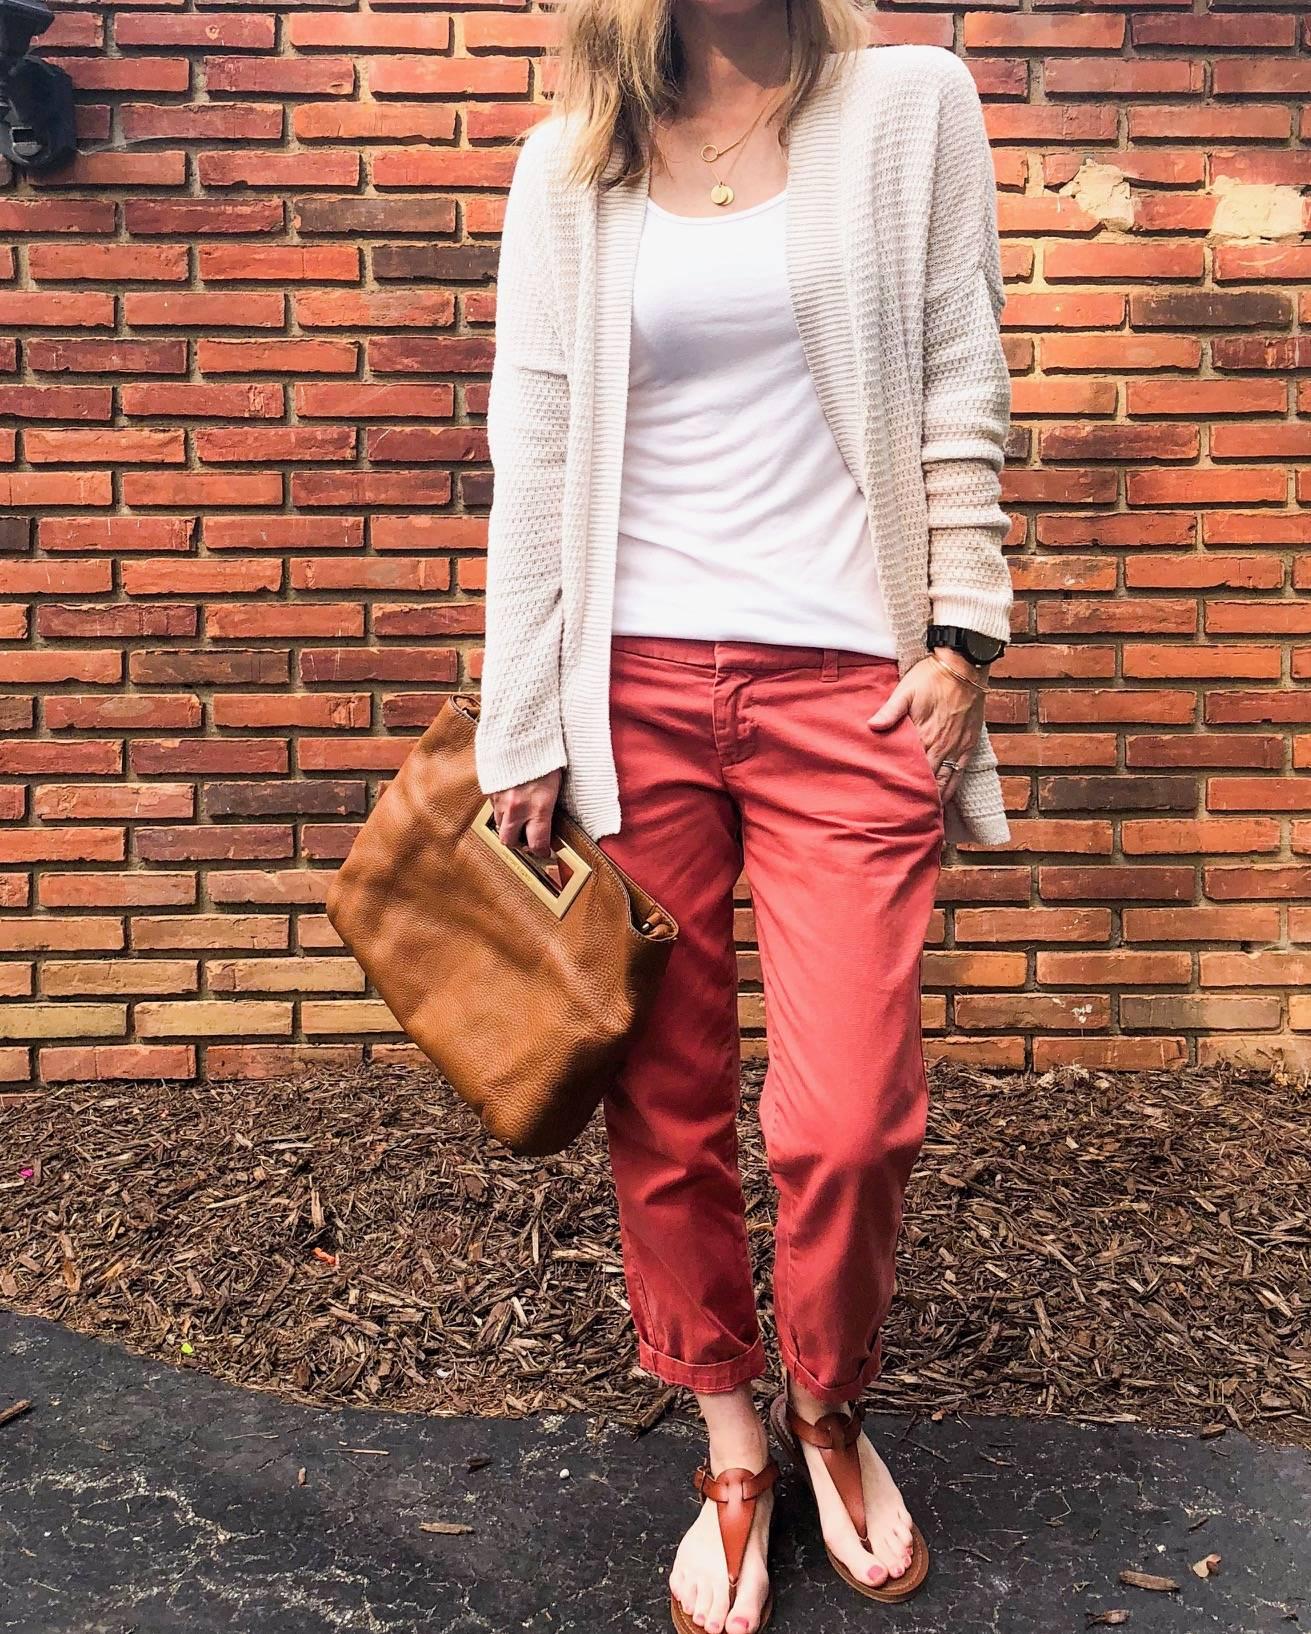 Daily Splendor - August Instagram Roundup #fallfashion #casualllook #fashion #sweater #handbag